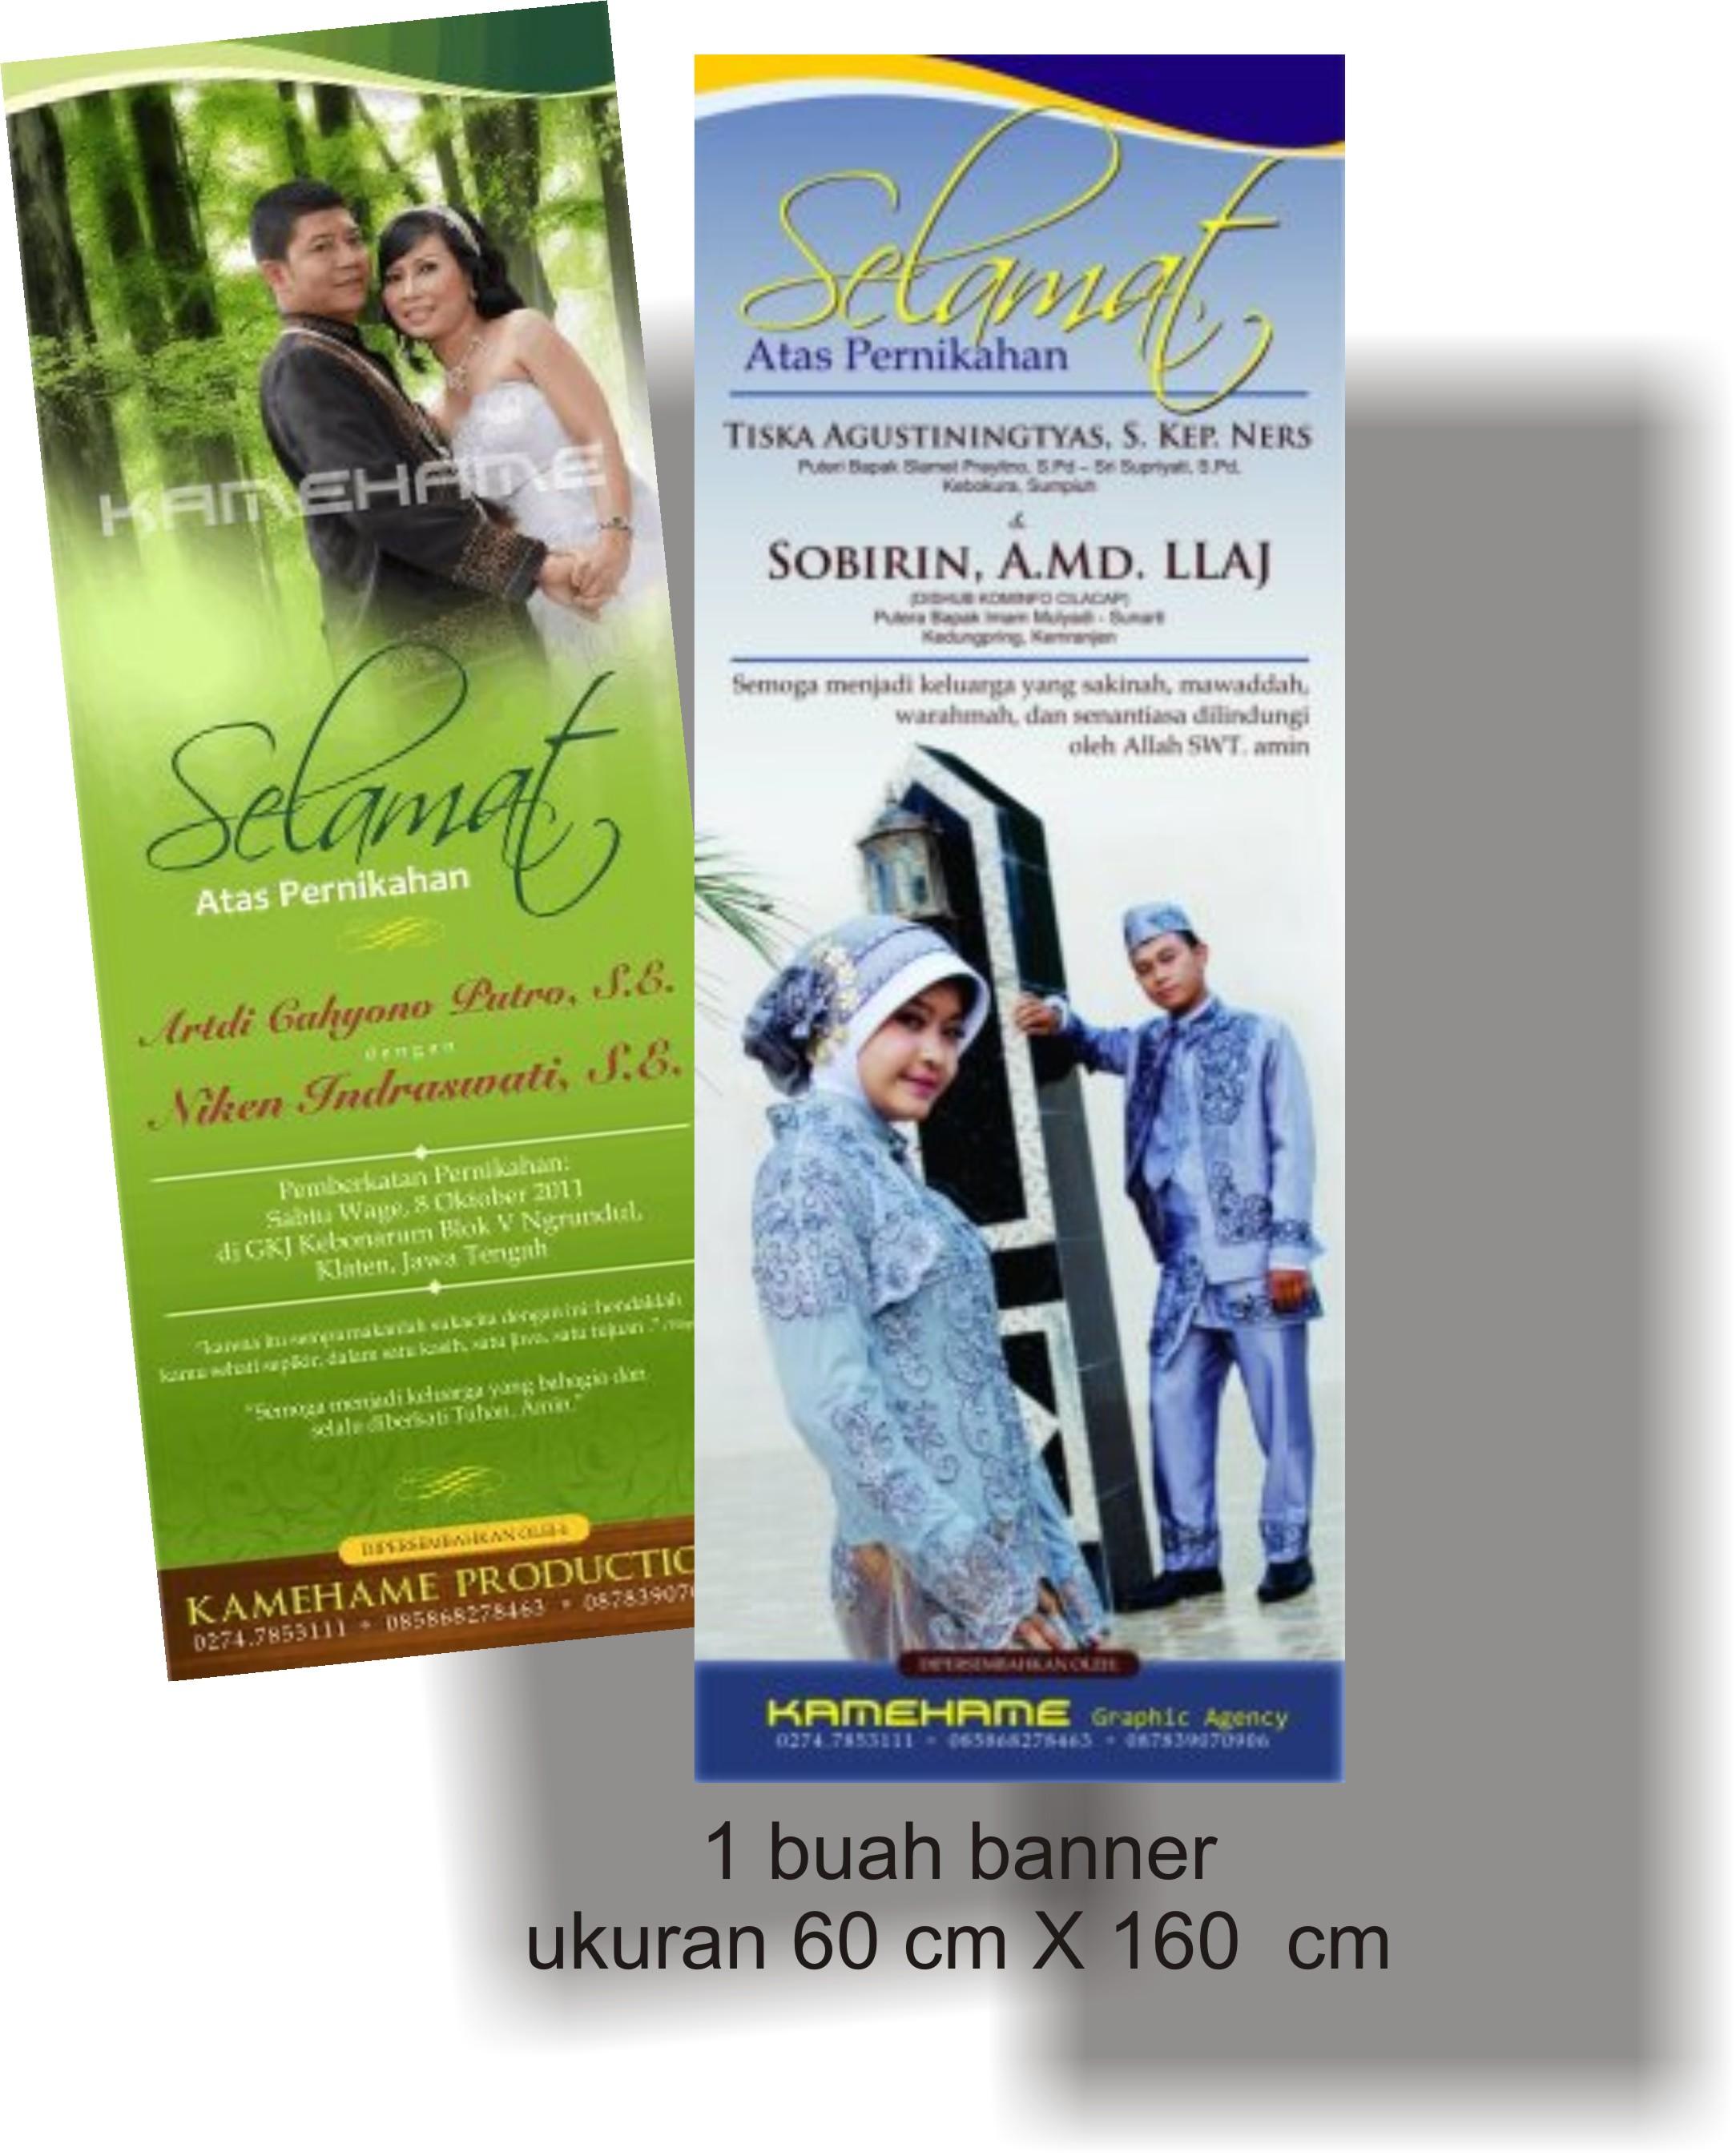 Design x banner pernikahan - Paket Bonus Undangan